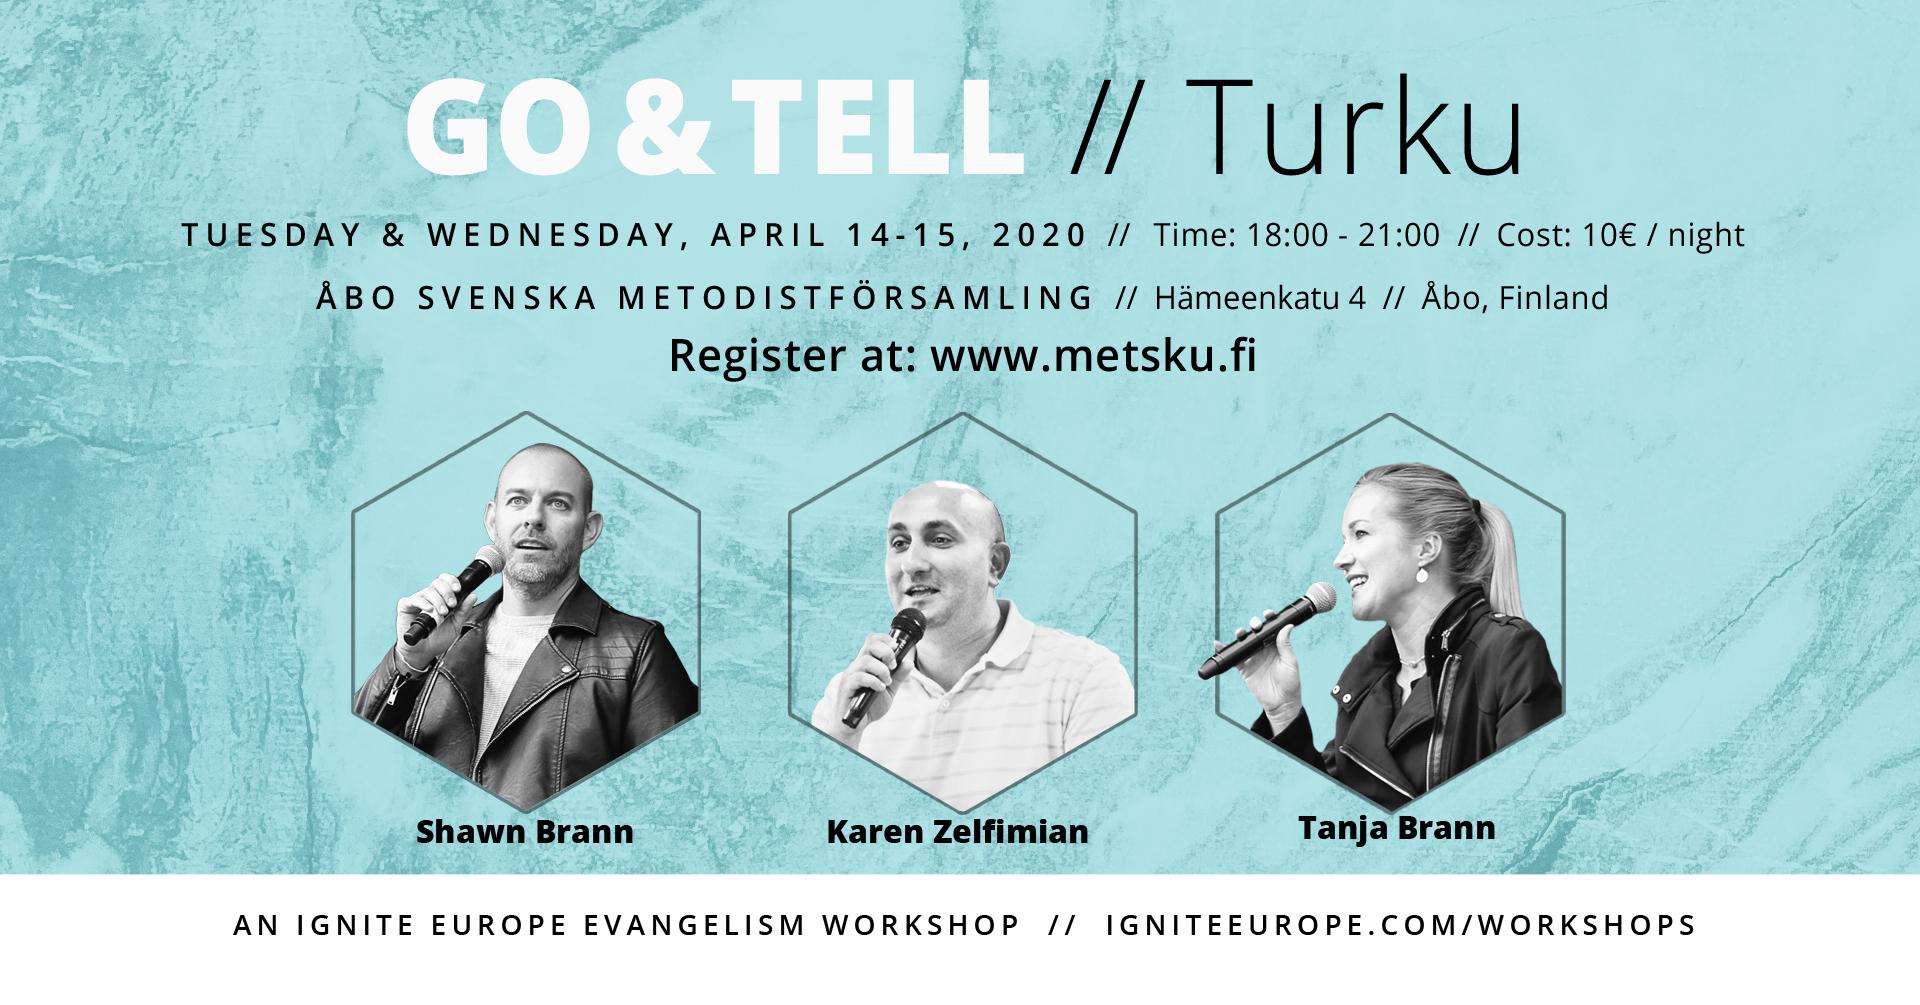 Go & Tell Turku Evankeliointi työpaja / Evangelisation workshop @ Åbo Metsku